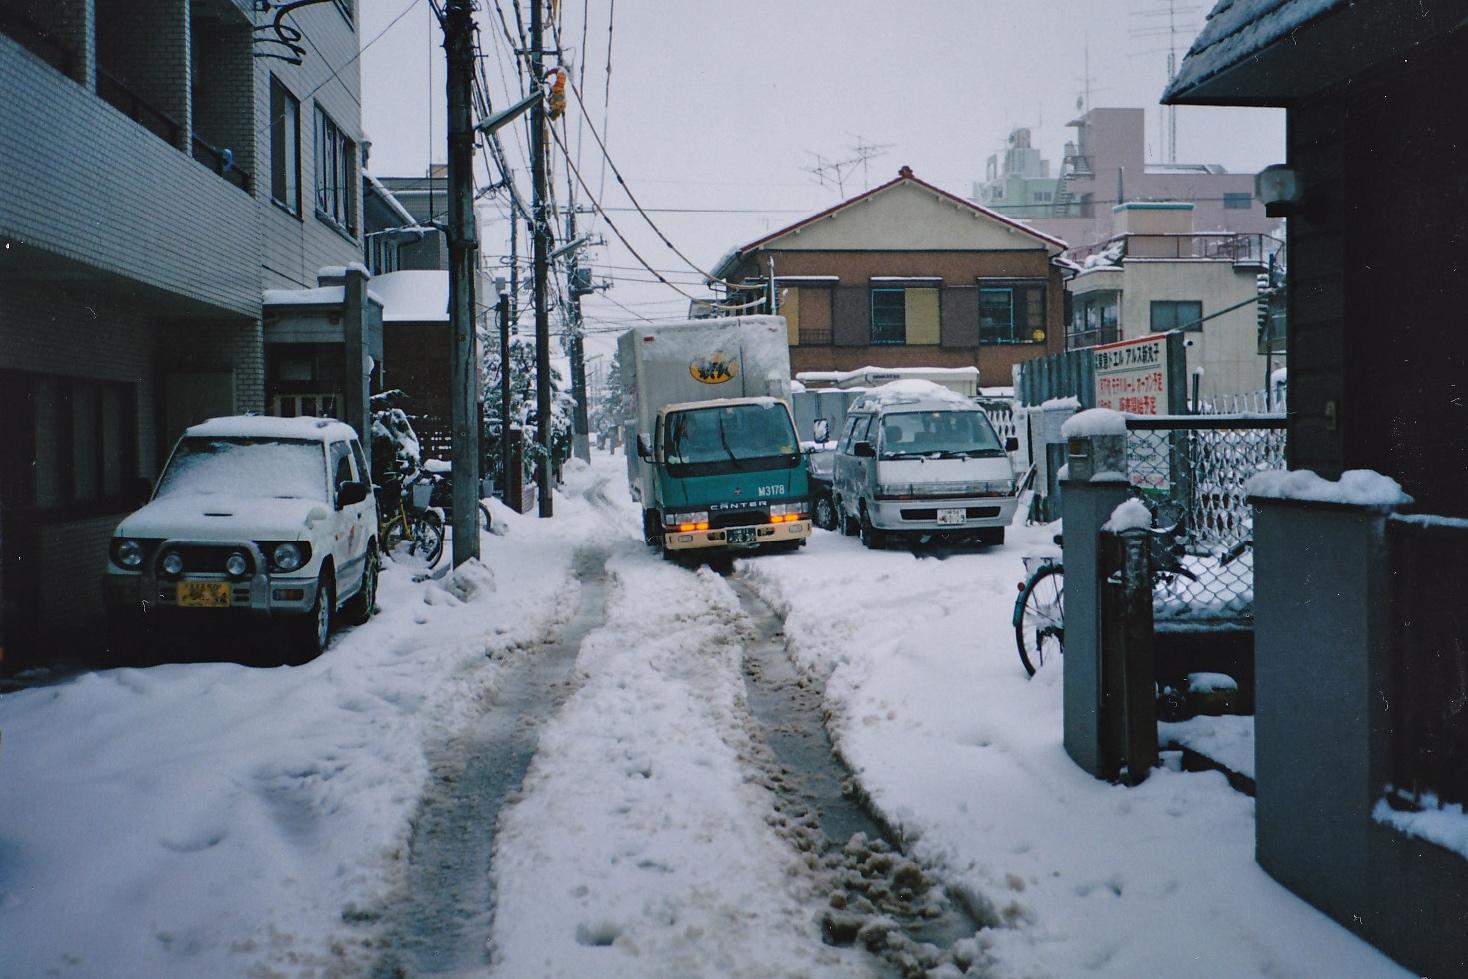 shimakou_0001_3.jpg